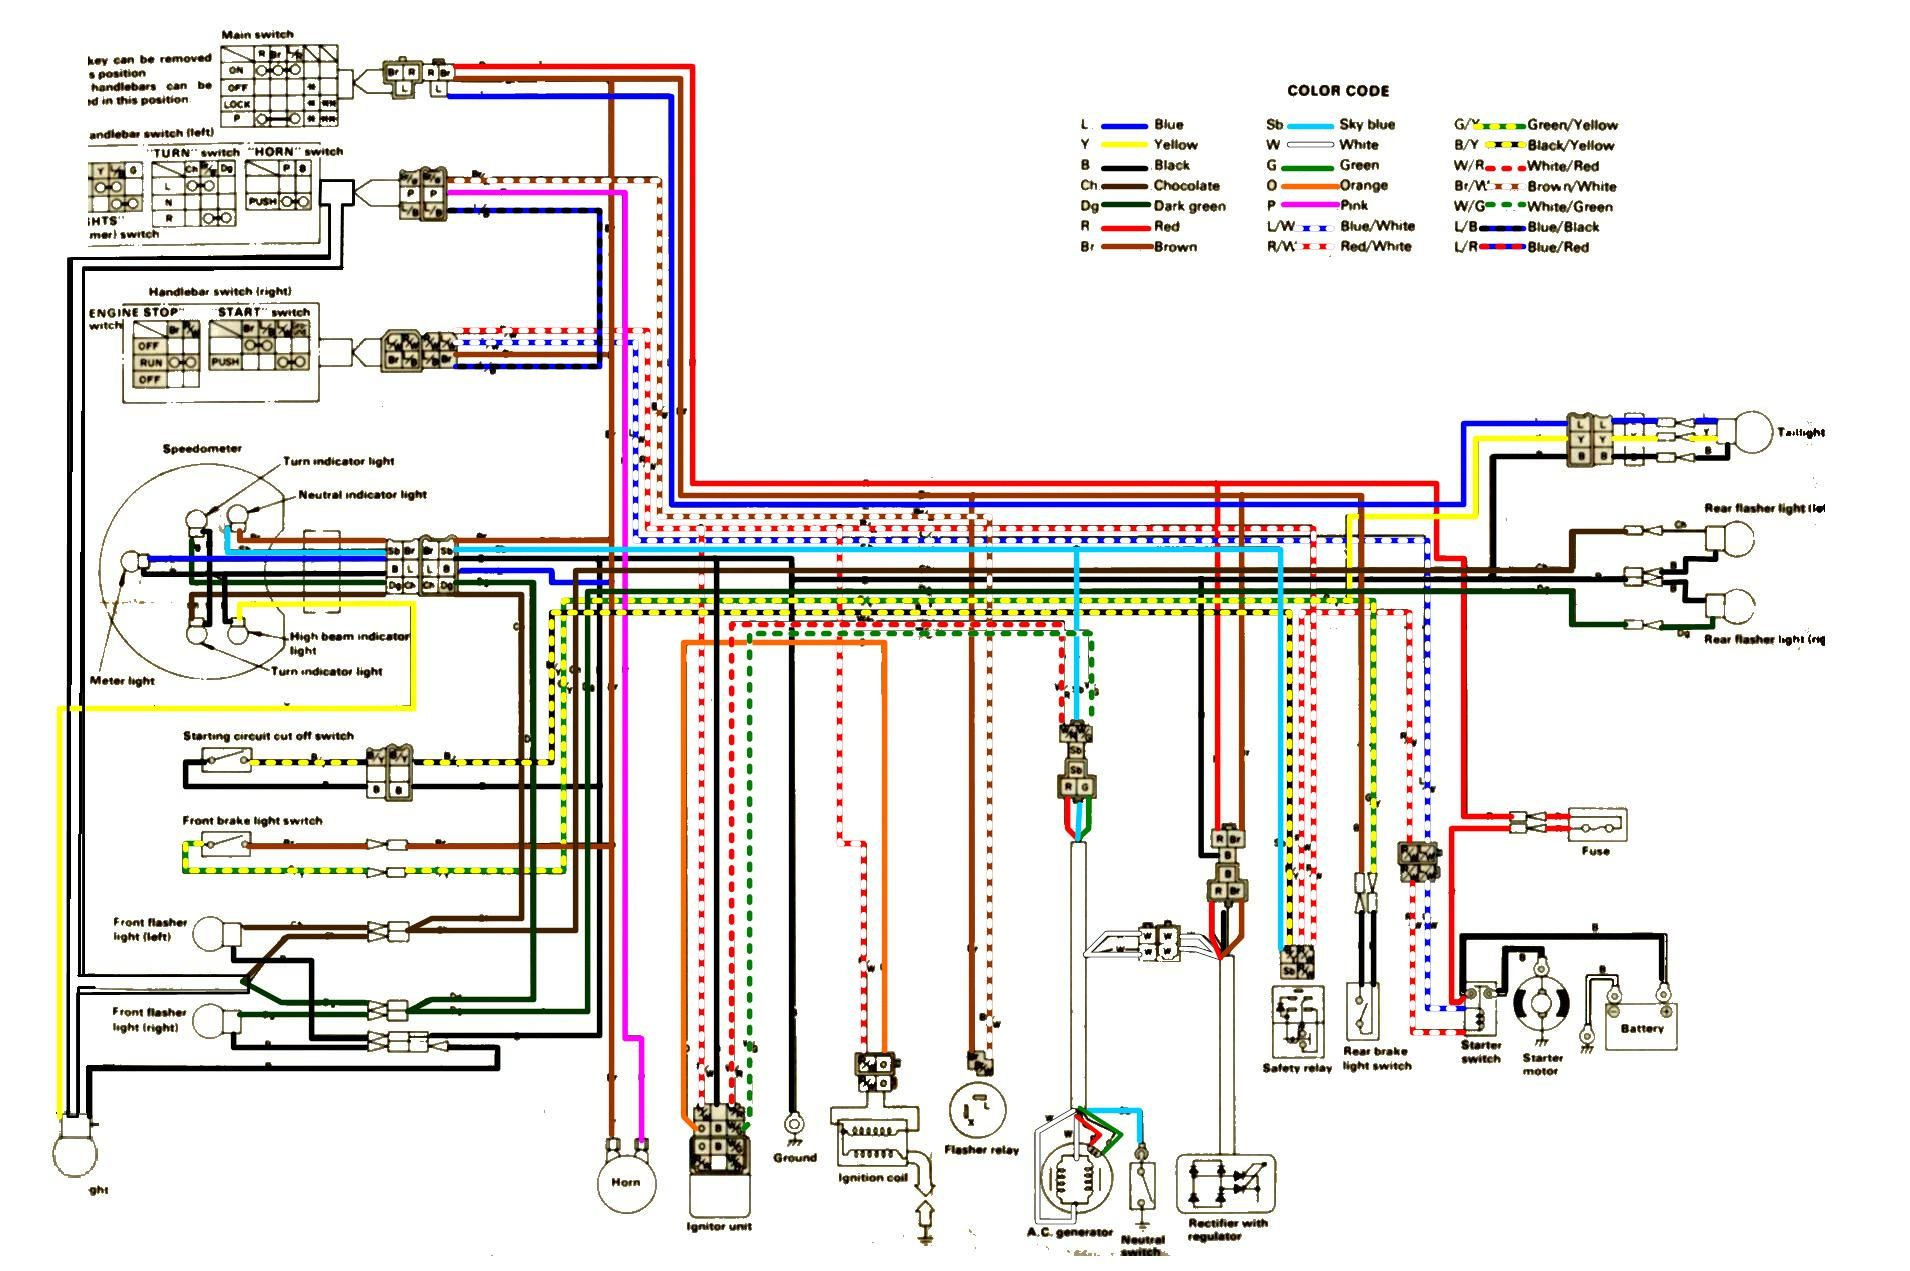 suzuki gn 125 electric circet pdf - 2000 jeep wrangler battery wiring -  schematics-source.tukune.jeanjaures37.fr  wiring diagram resource